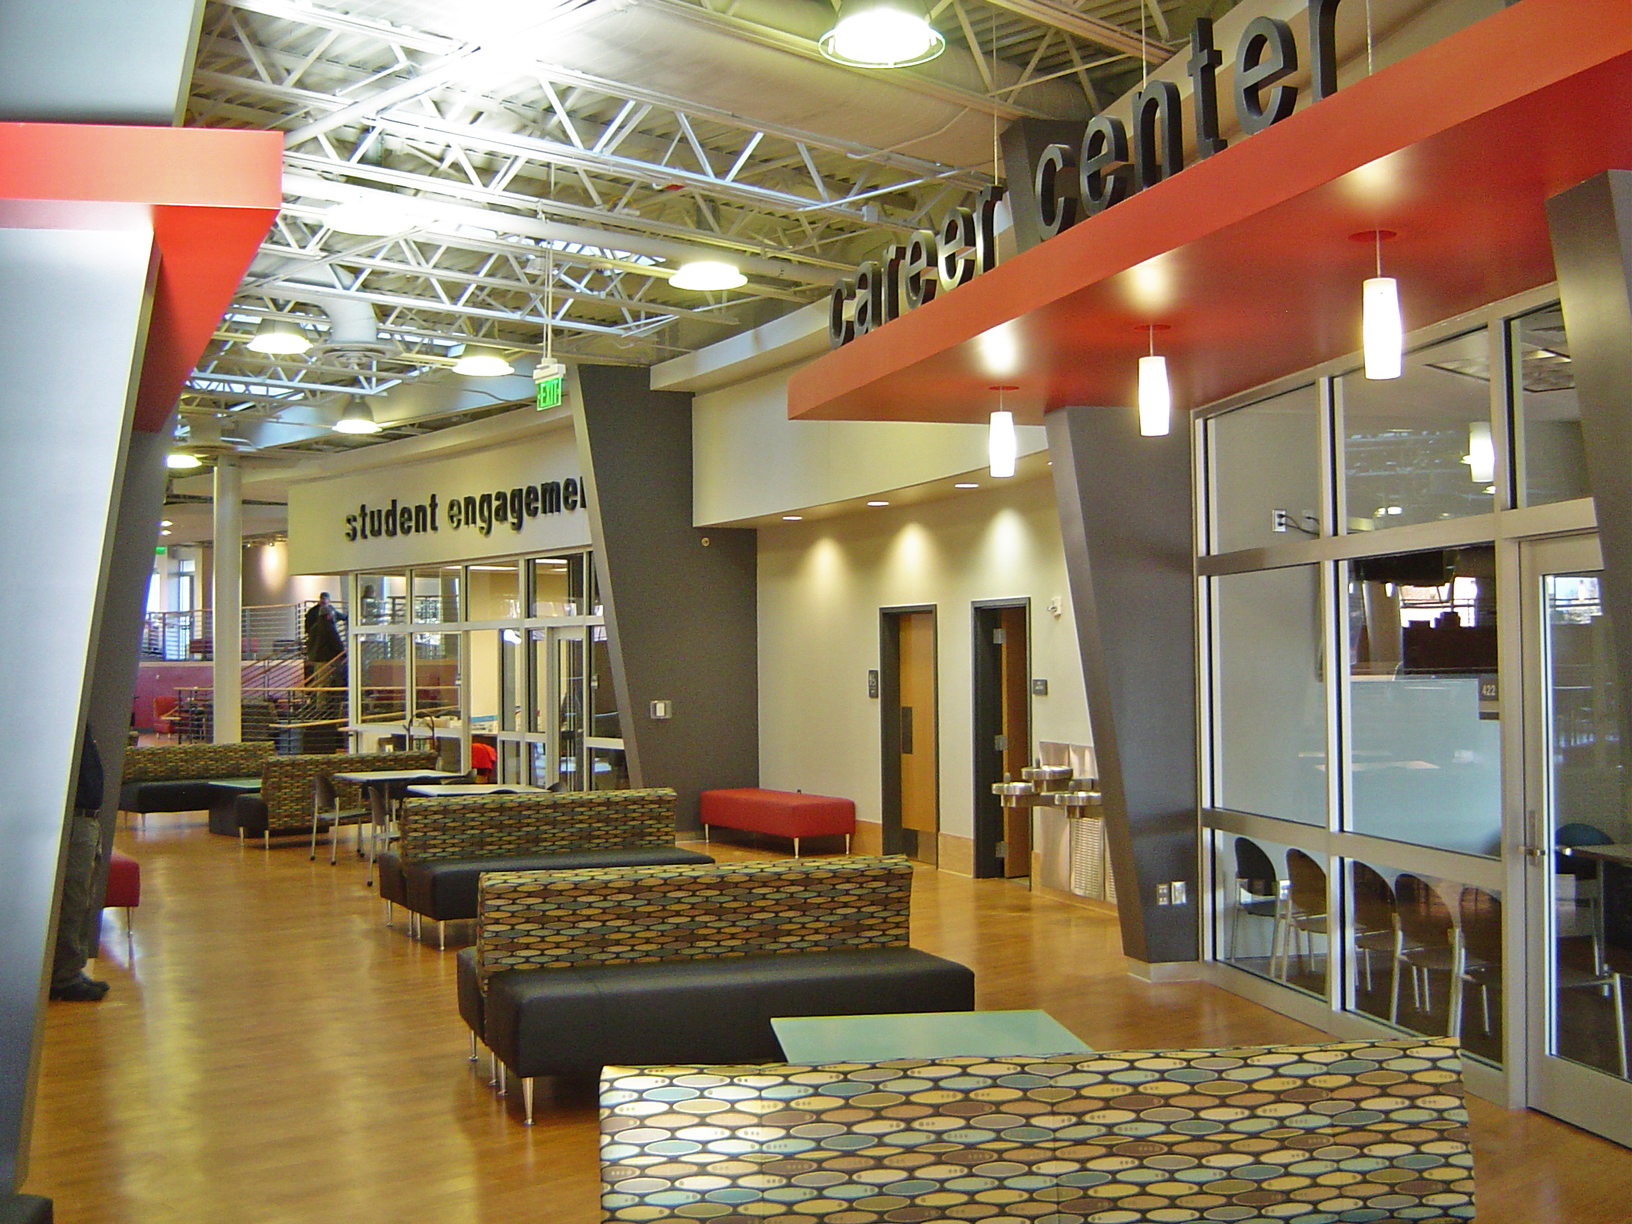 ADW-Higher-Education-CVCC-Hickory-NC-Student-Center-Interior.jpg